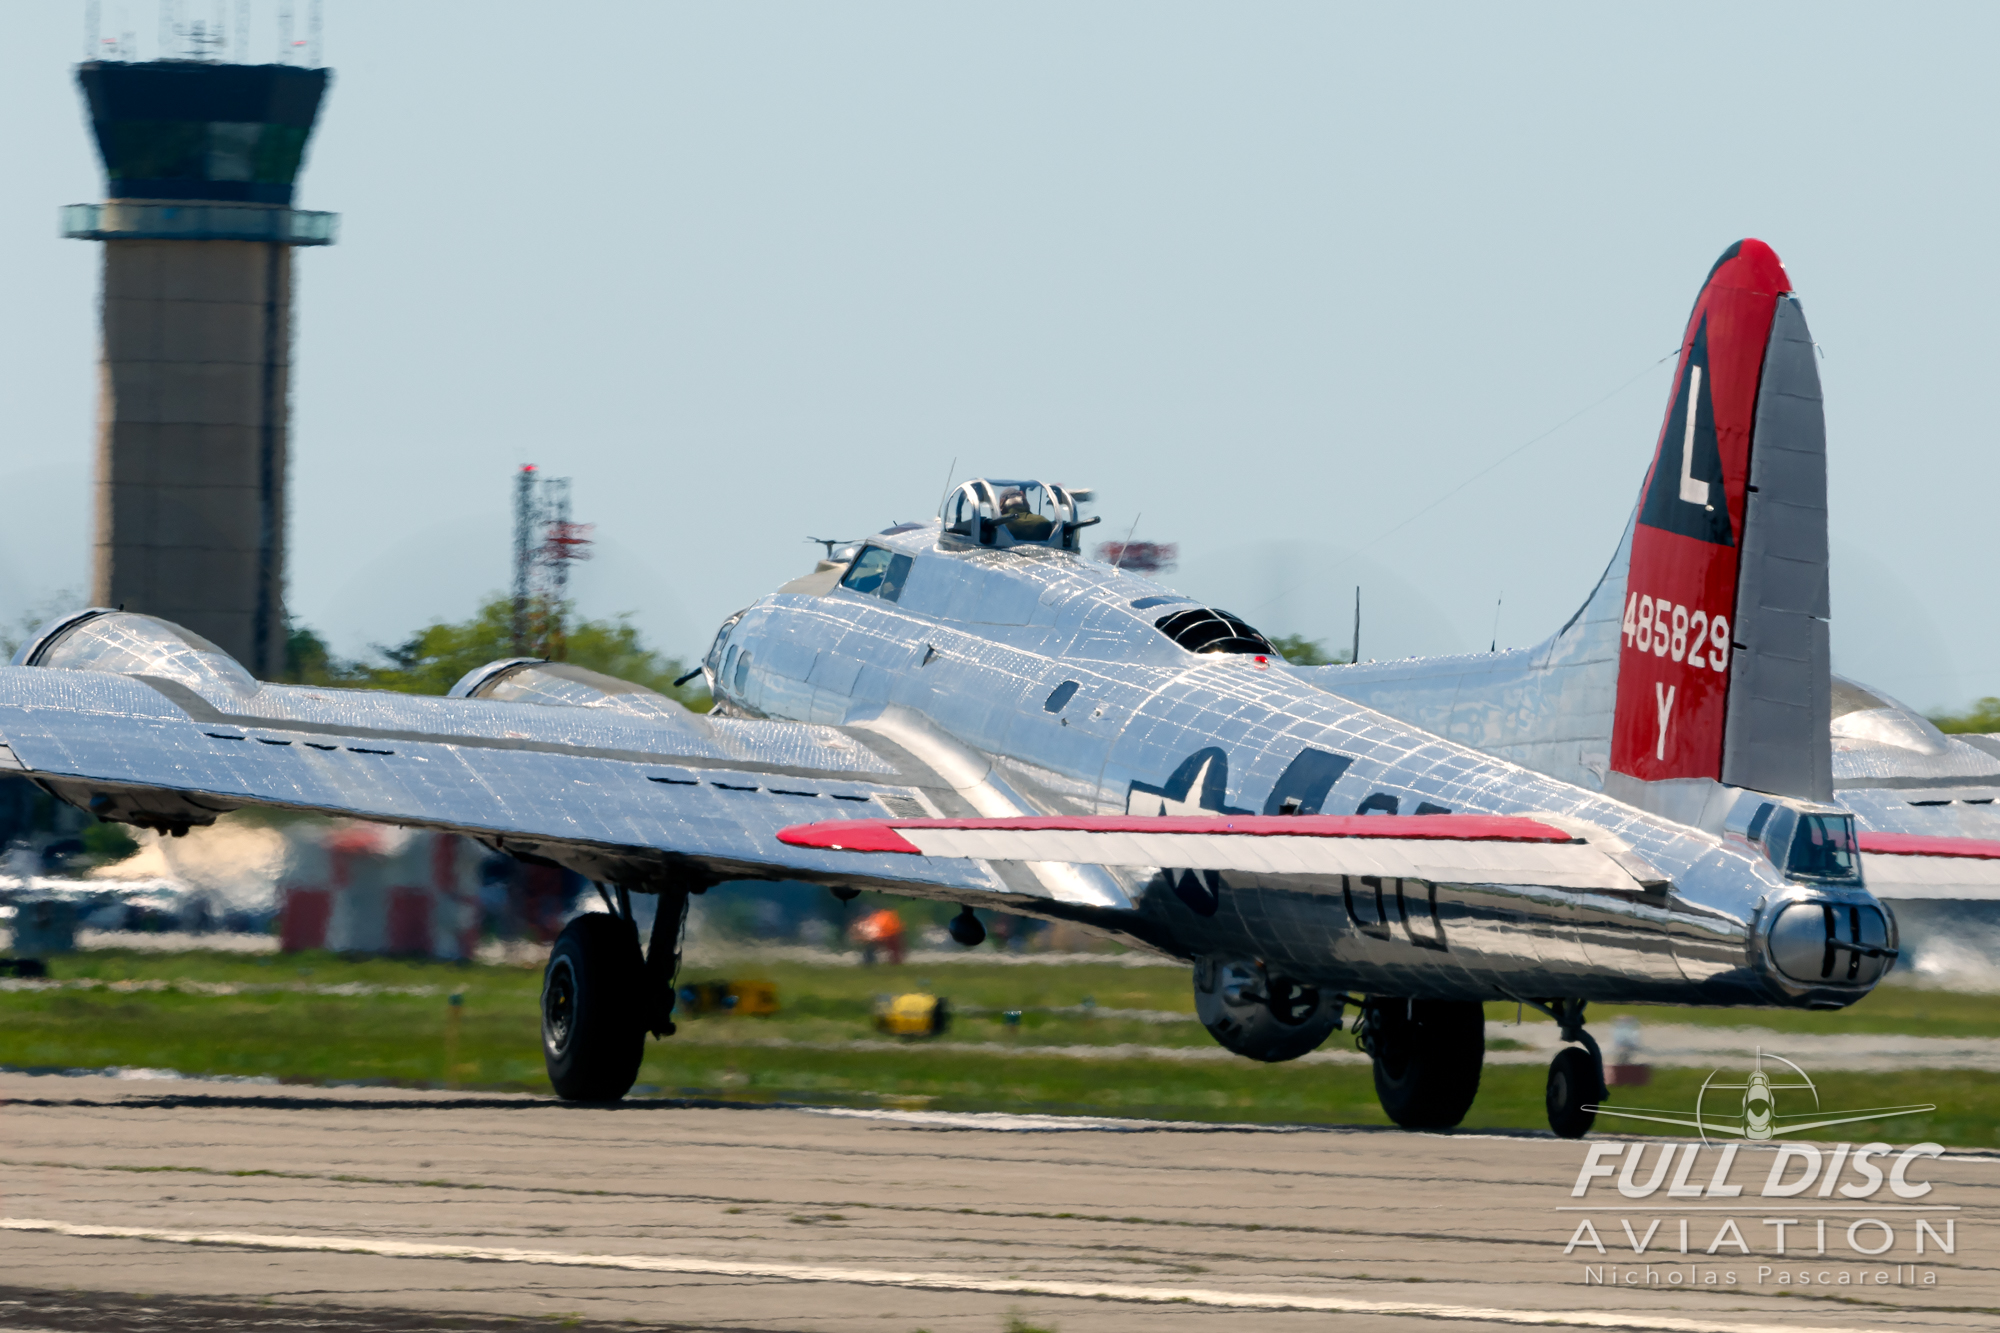 americanairpowermuseum_nicholaspascarella_nickpascarella_fulldiscaviation_legendsofairpower2019_aviation_warbird_b17_takeoff_jelly_tower.jpg